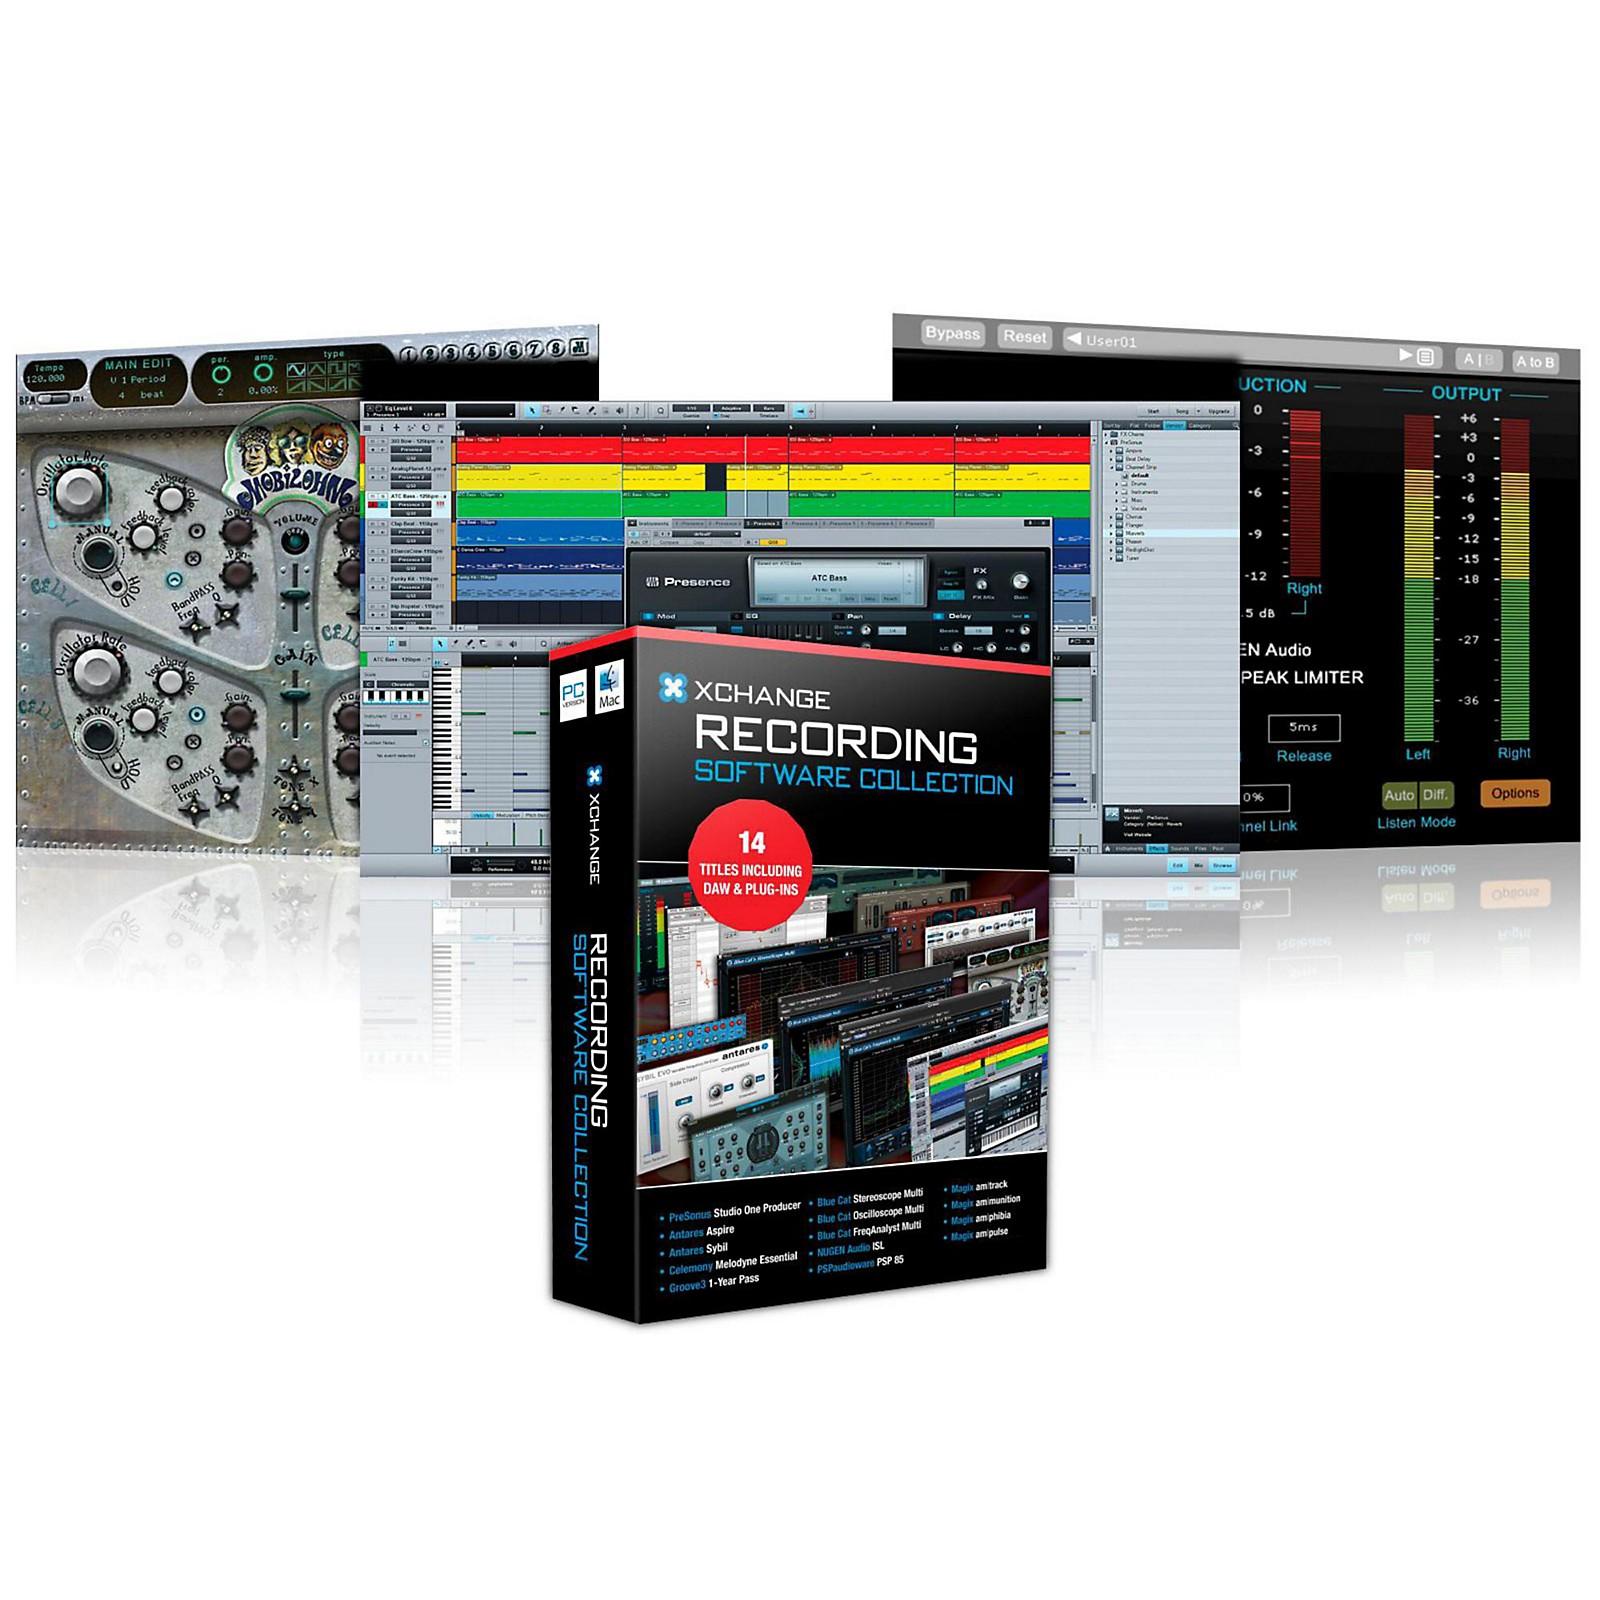 XCHANGE Recording Collection With PreSonus, Antares, Celemony, Blue Cat Audio, Ohm Force and Magix